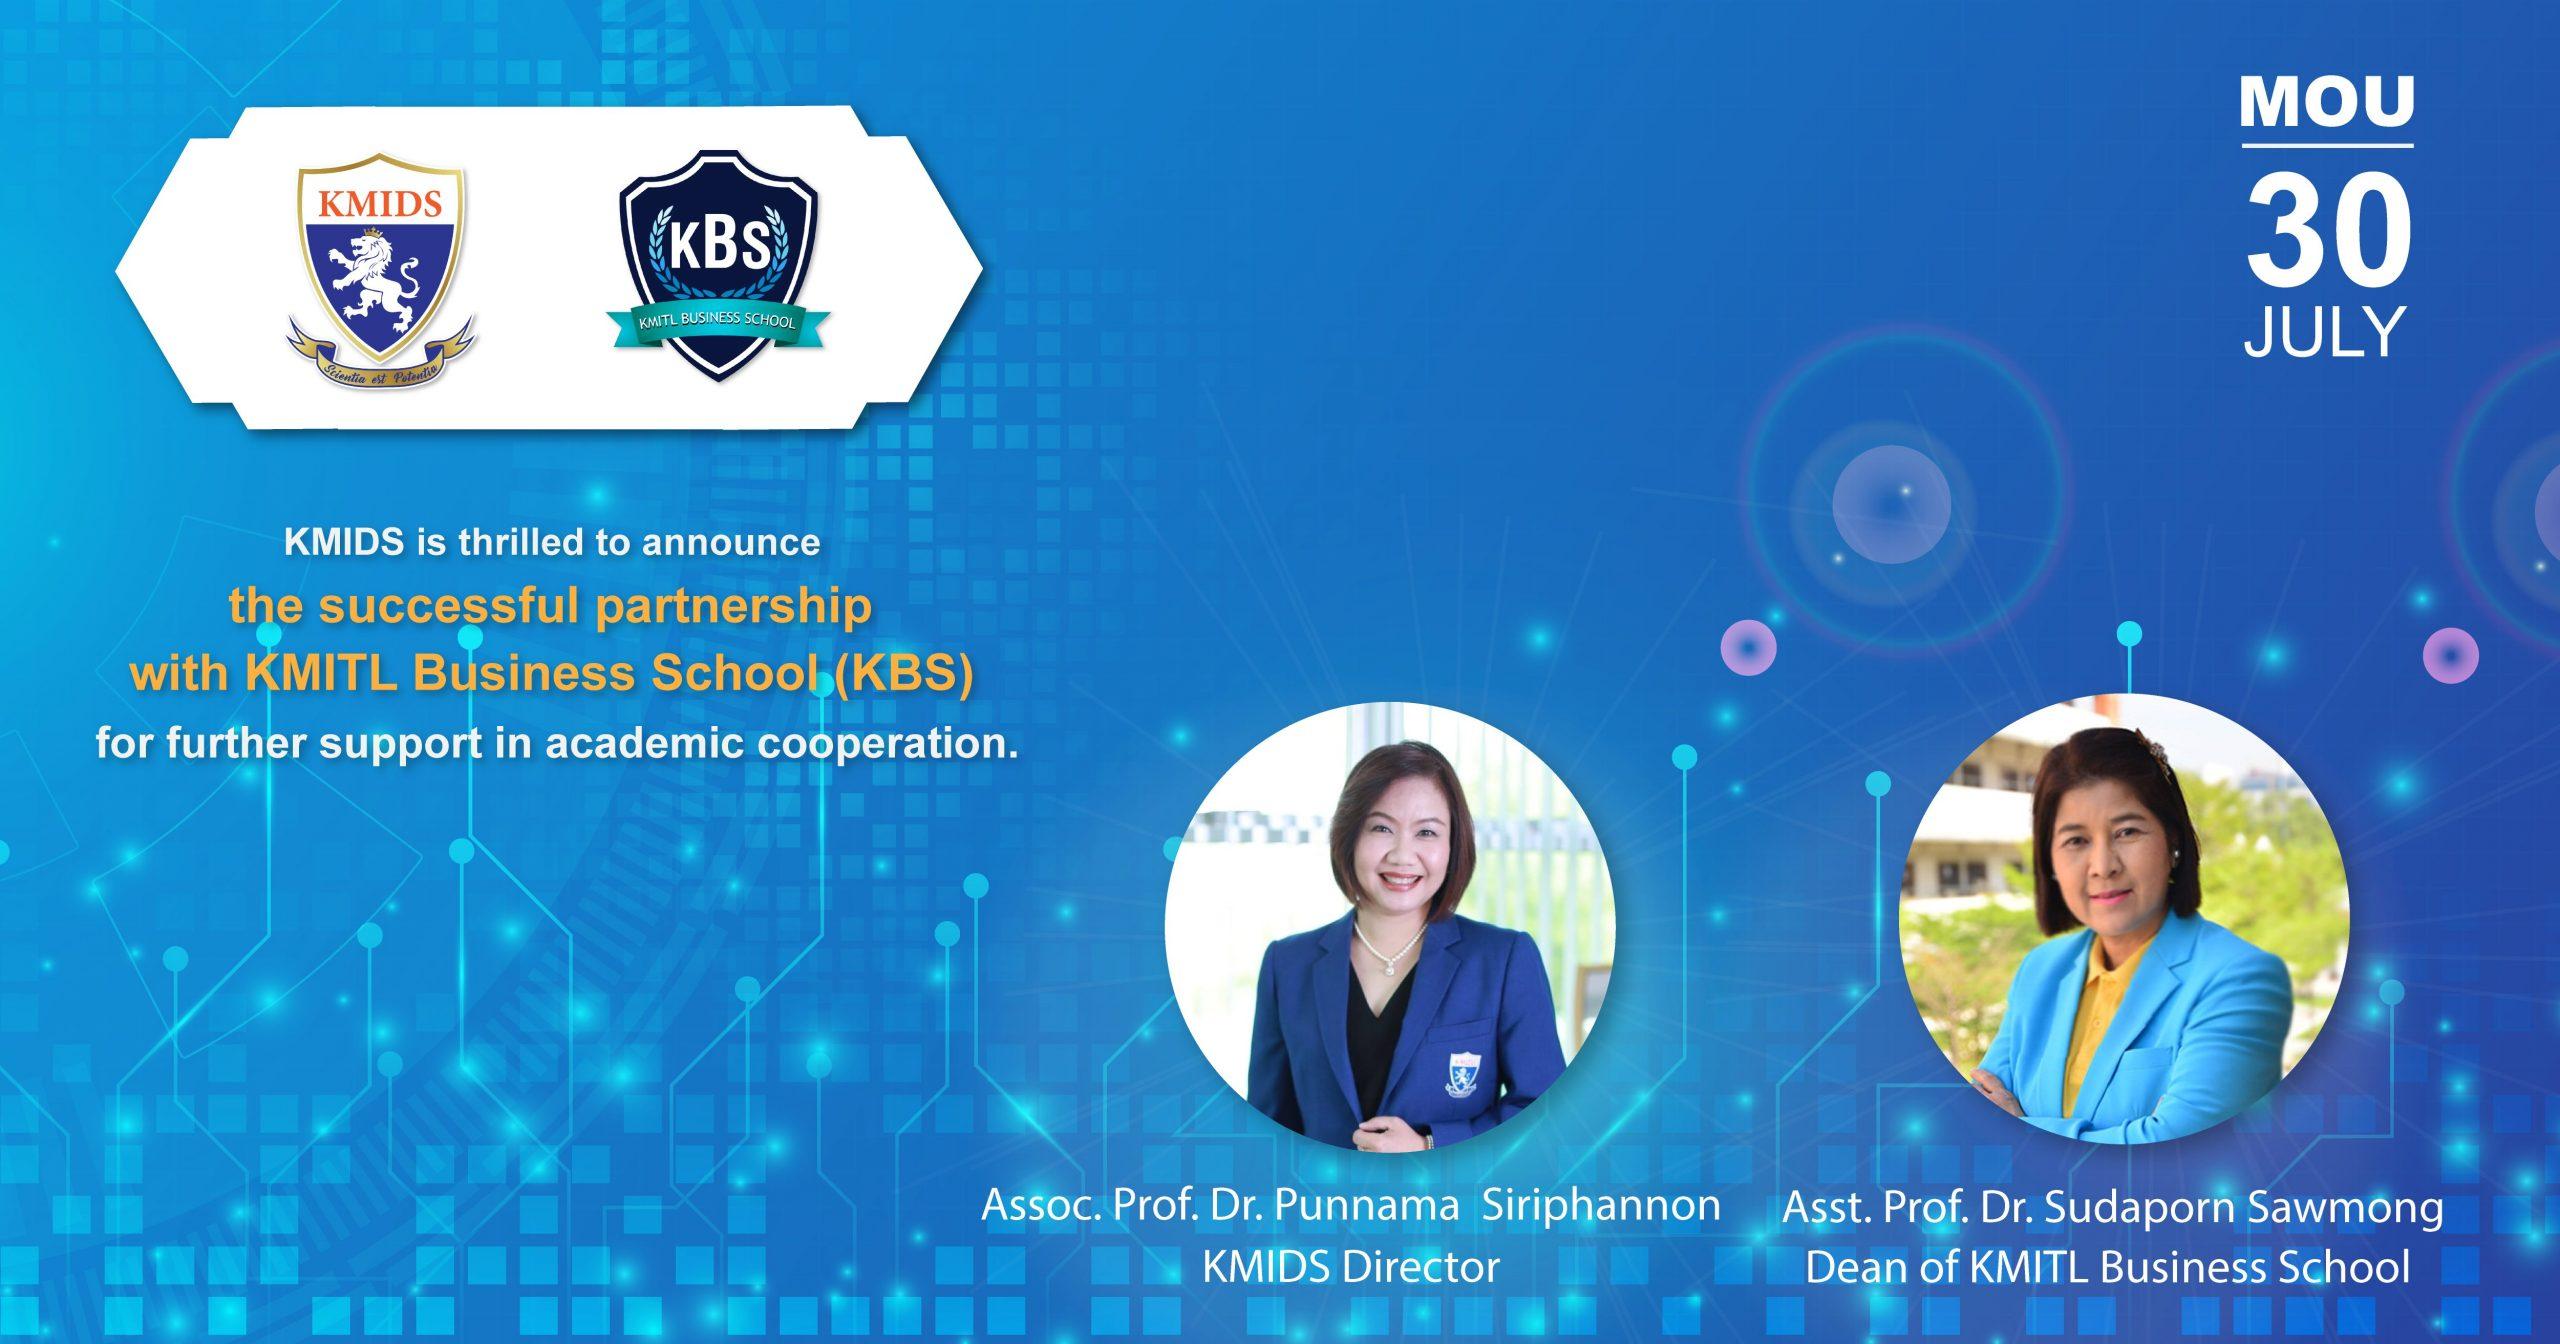 MOU KBS 30 1-01